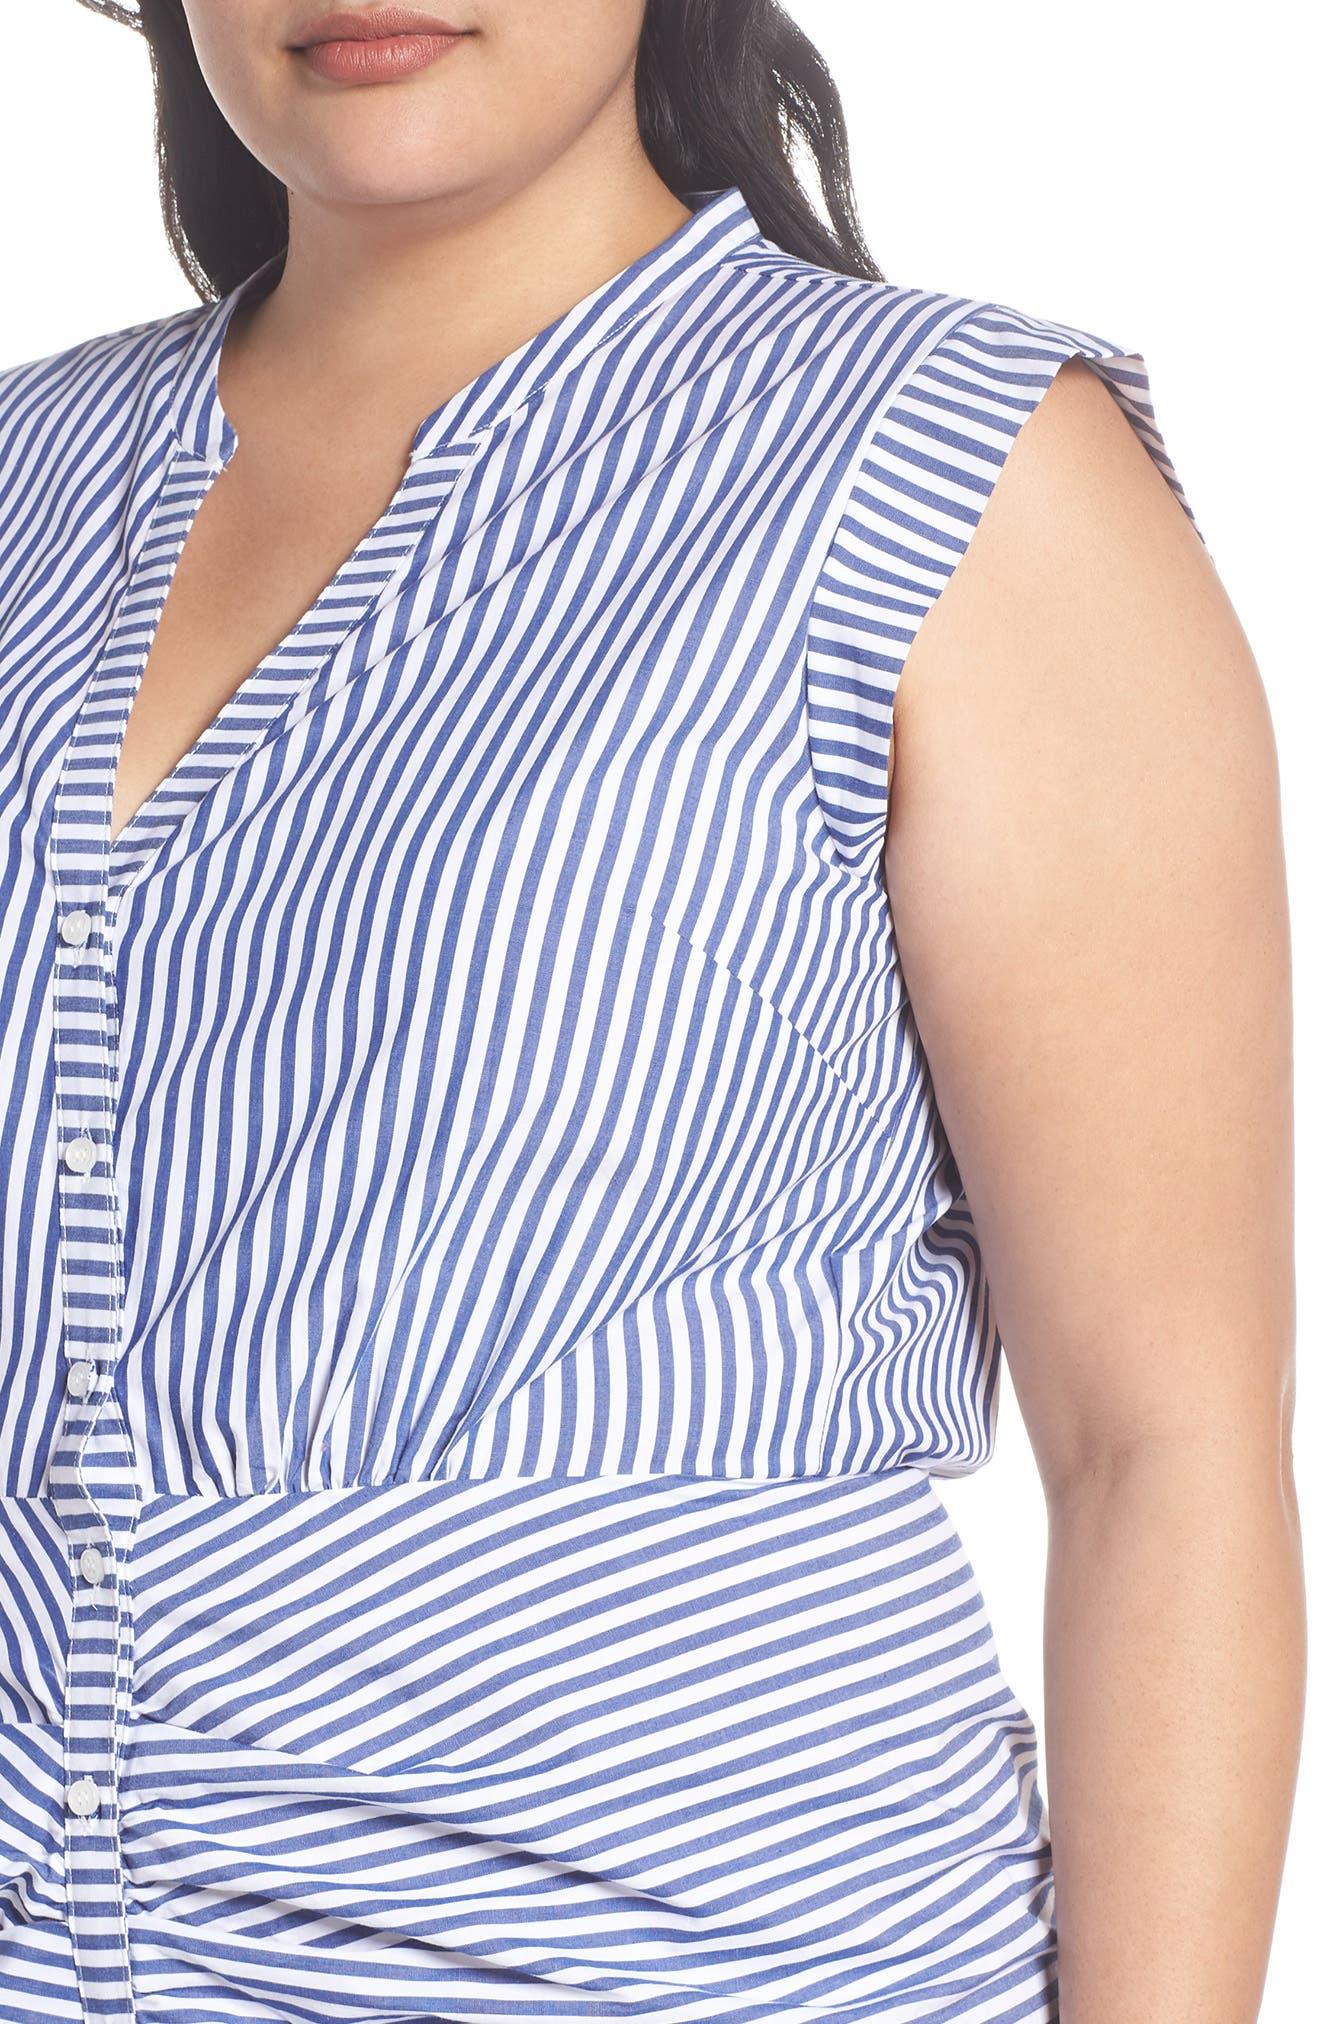 Stripe Ruched Cotton Shirtdress,                             Alternate thumbnail 7, color,                             Blue White Stripe